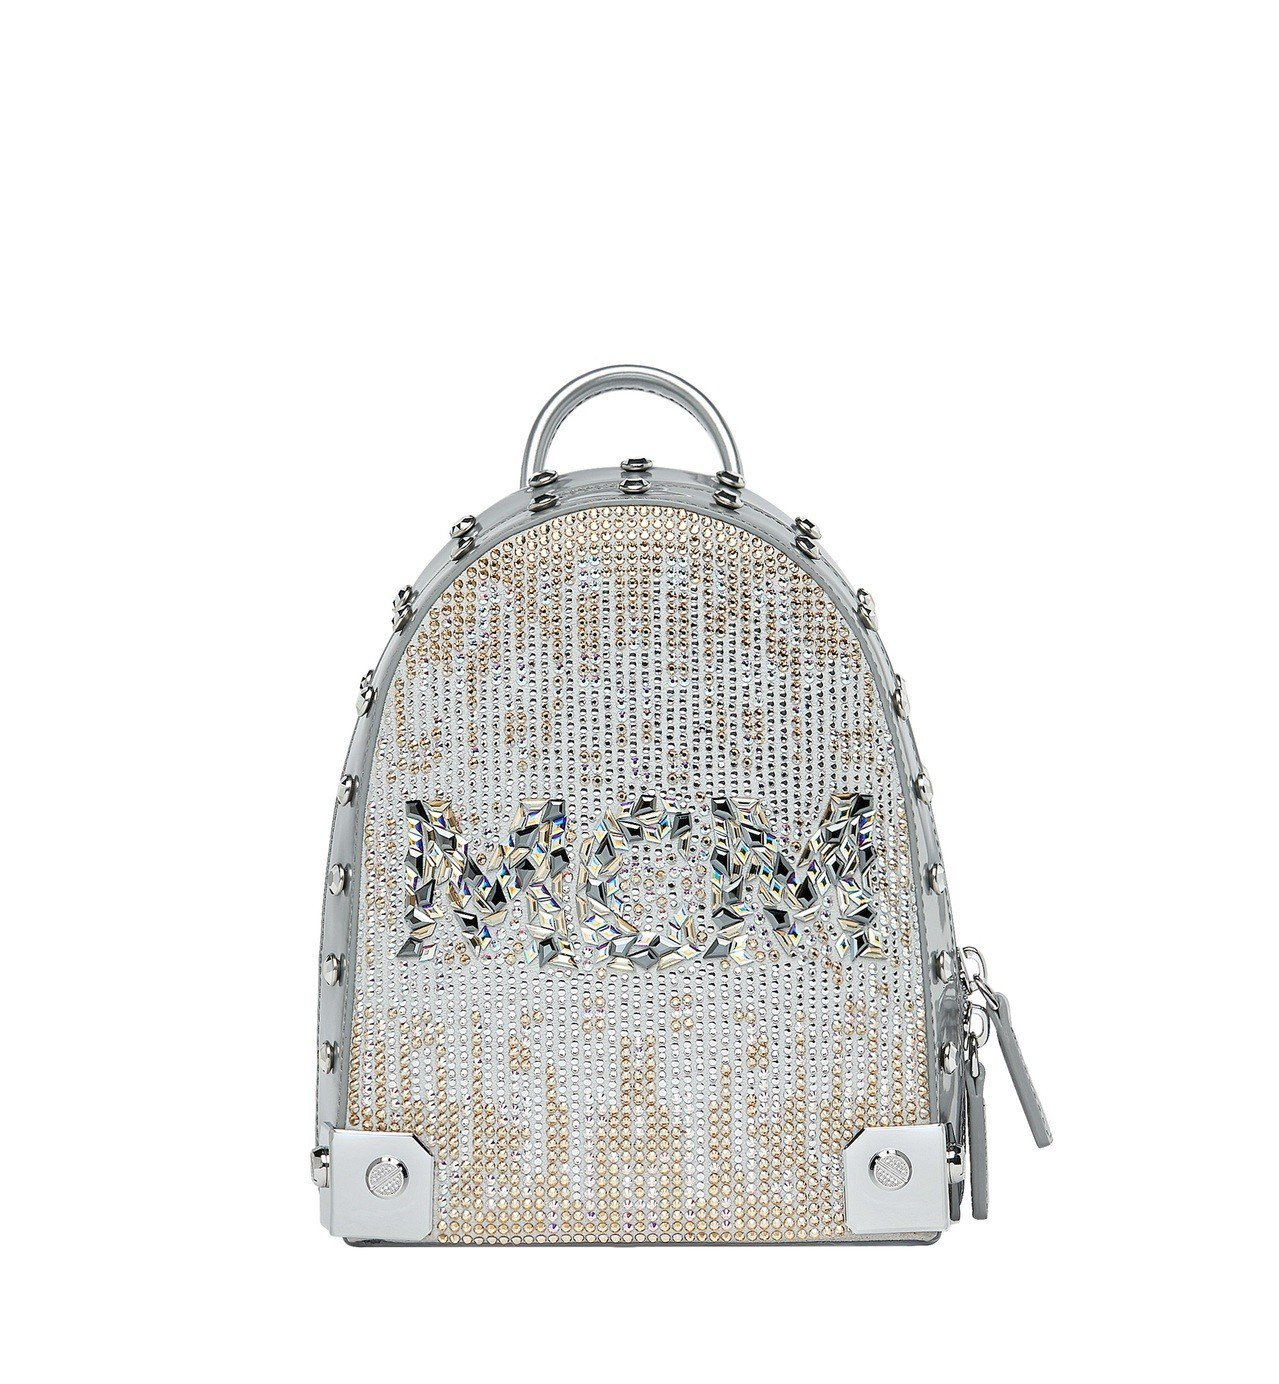 MCM Stark銀色水晶後背包,售價11萬7,000元。圖/MCM提供